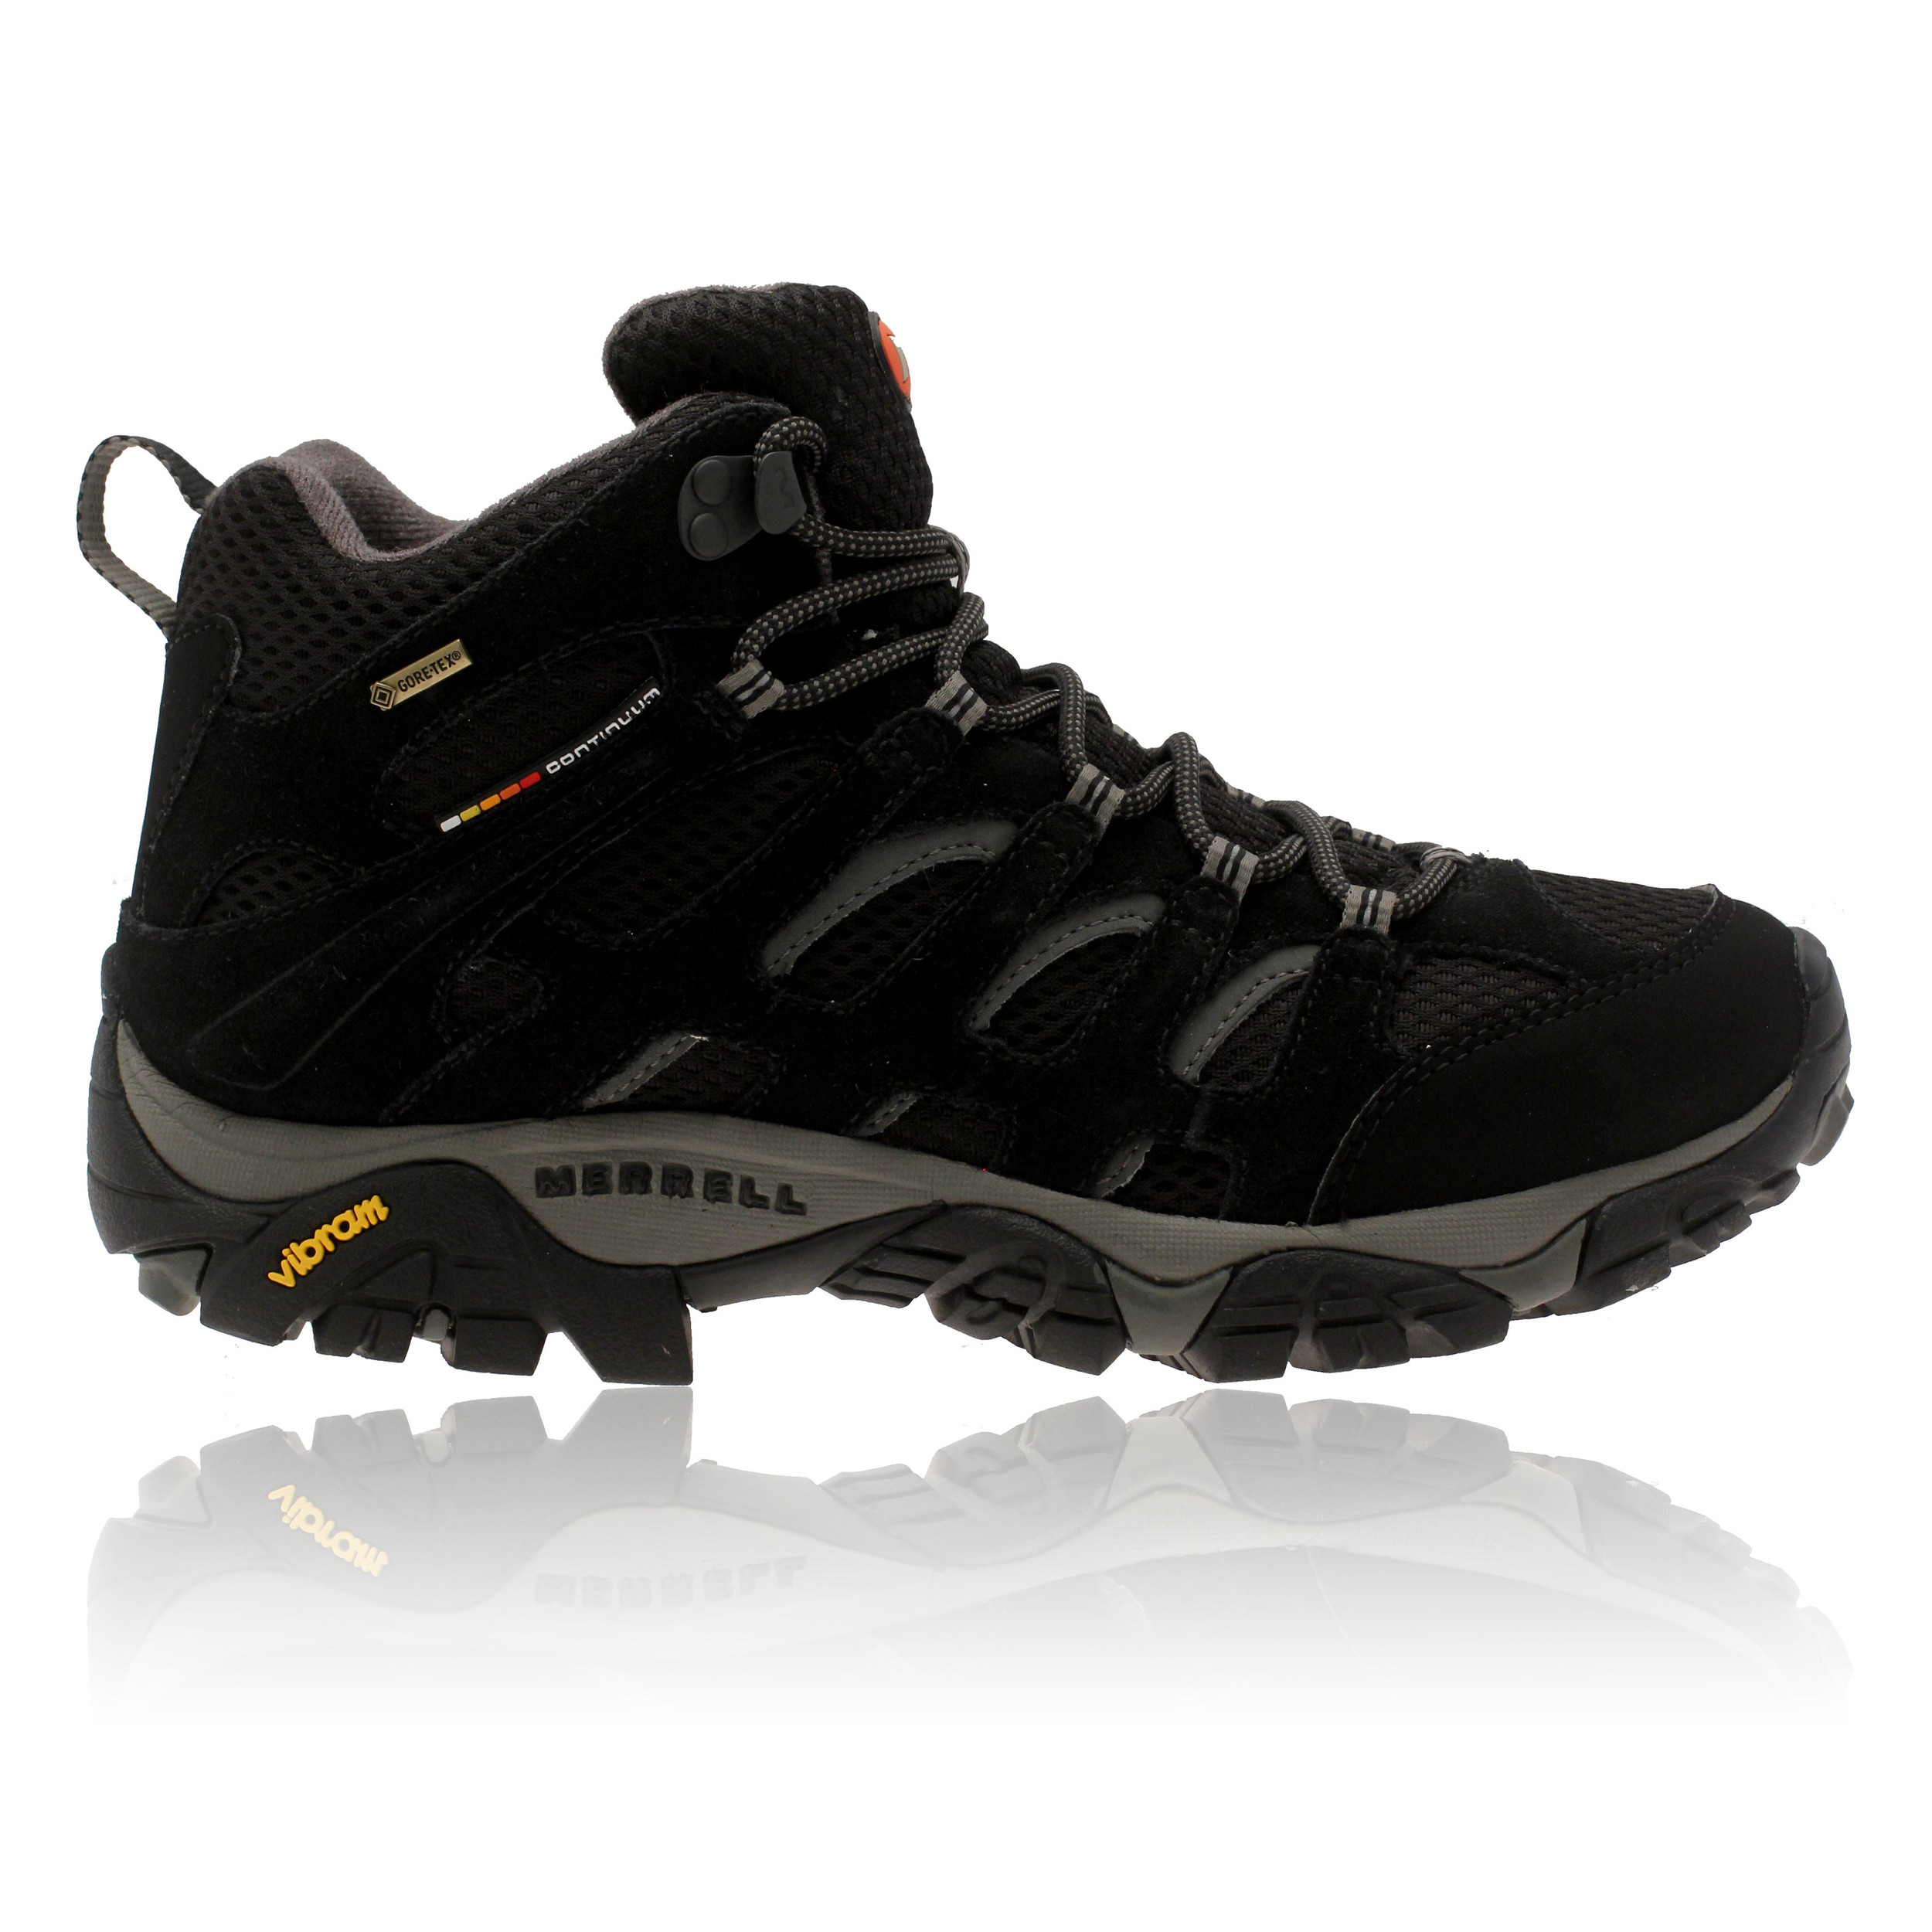 Merrell Moab Gore Tex Walking Shoes